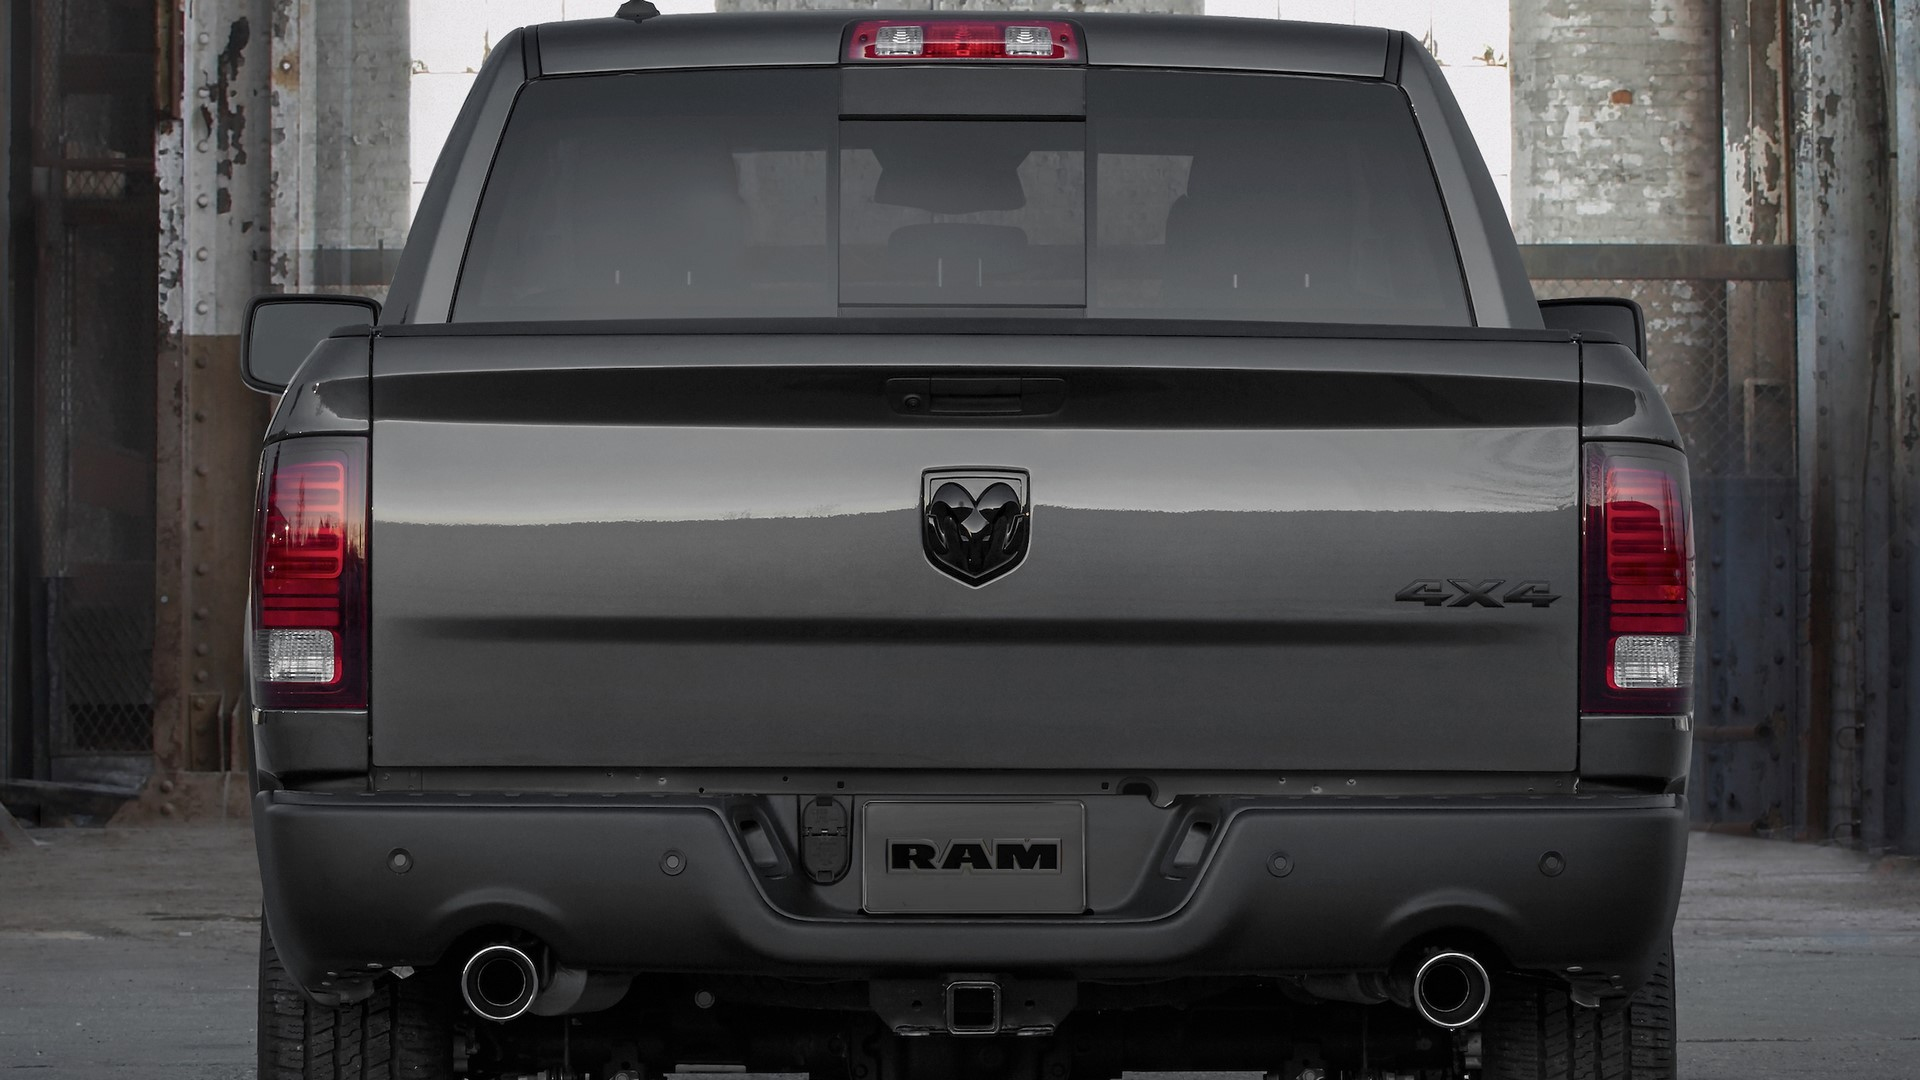 Ram 1500 Warlock 2019 (4)